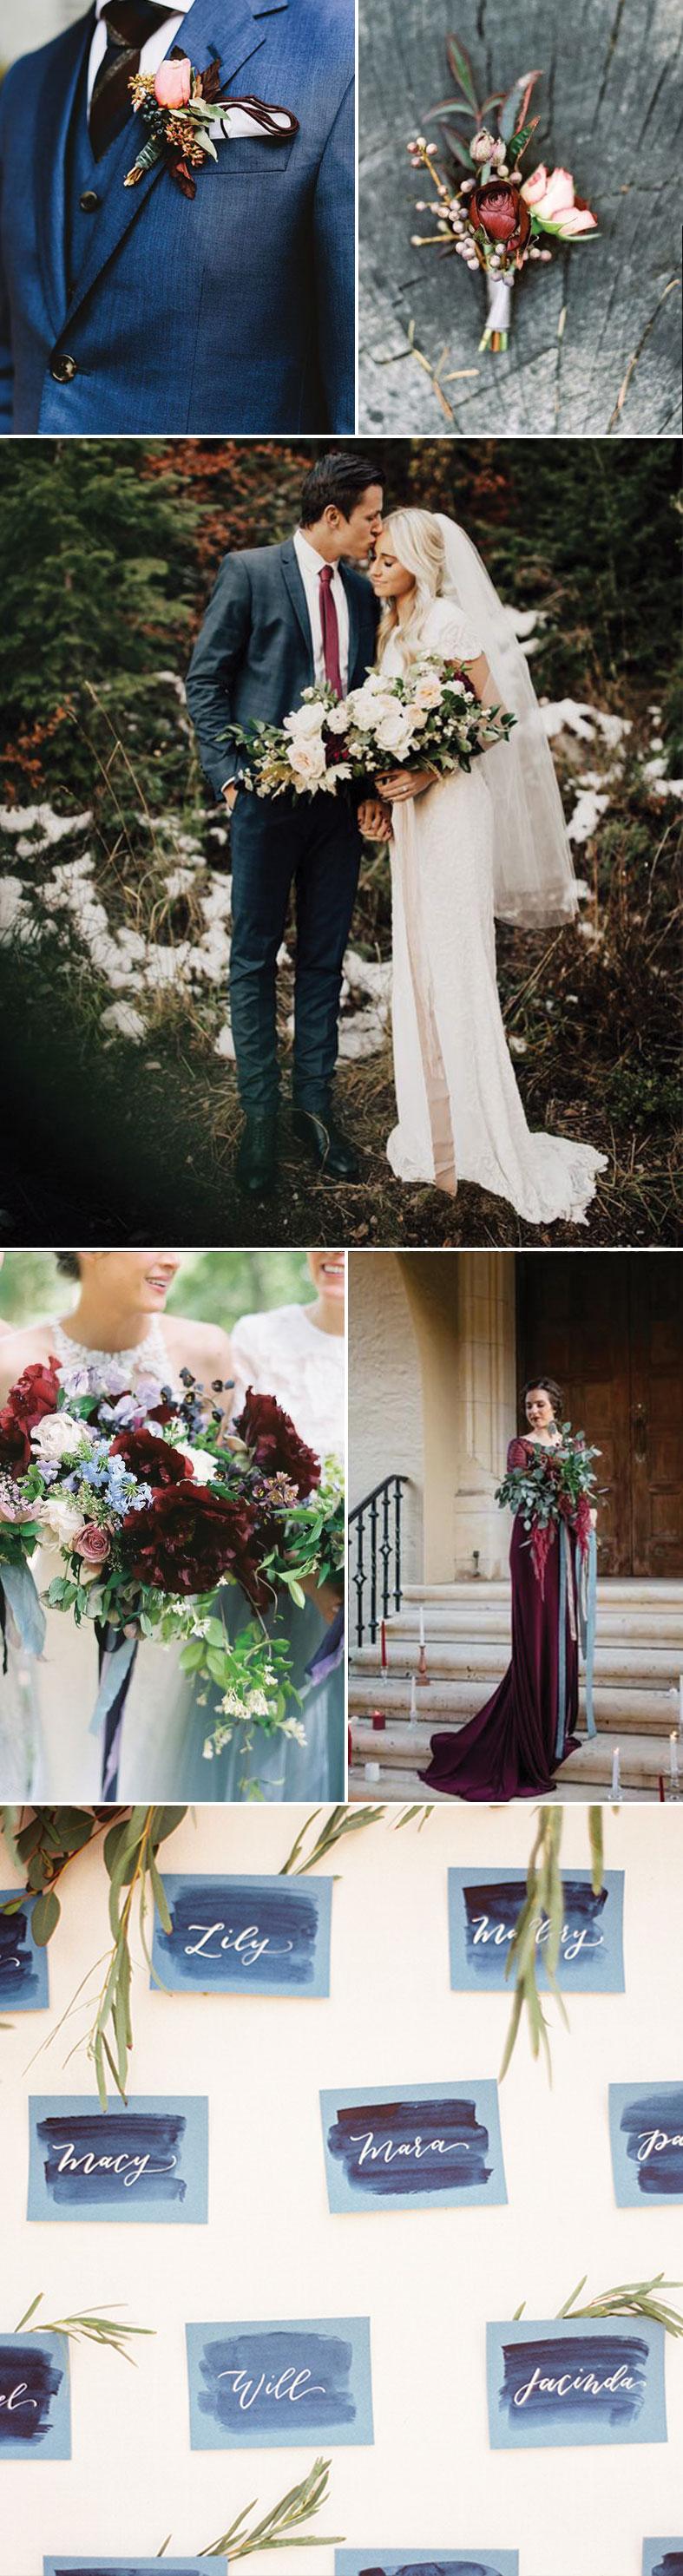 Wedding Ideas In Burgundy And Dusty Blue Groomsmen Accessories In